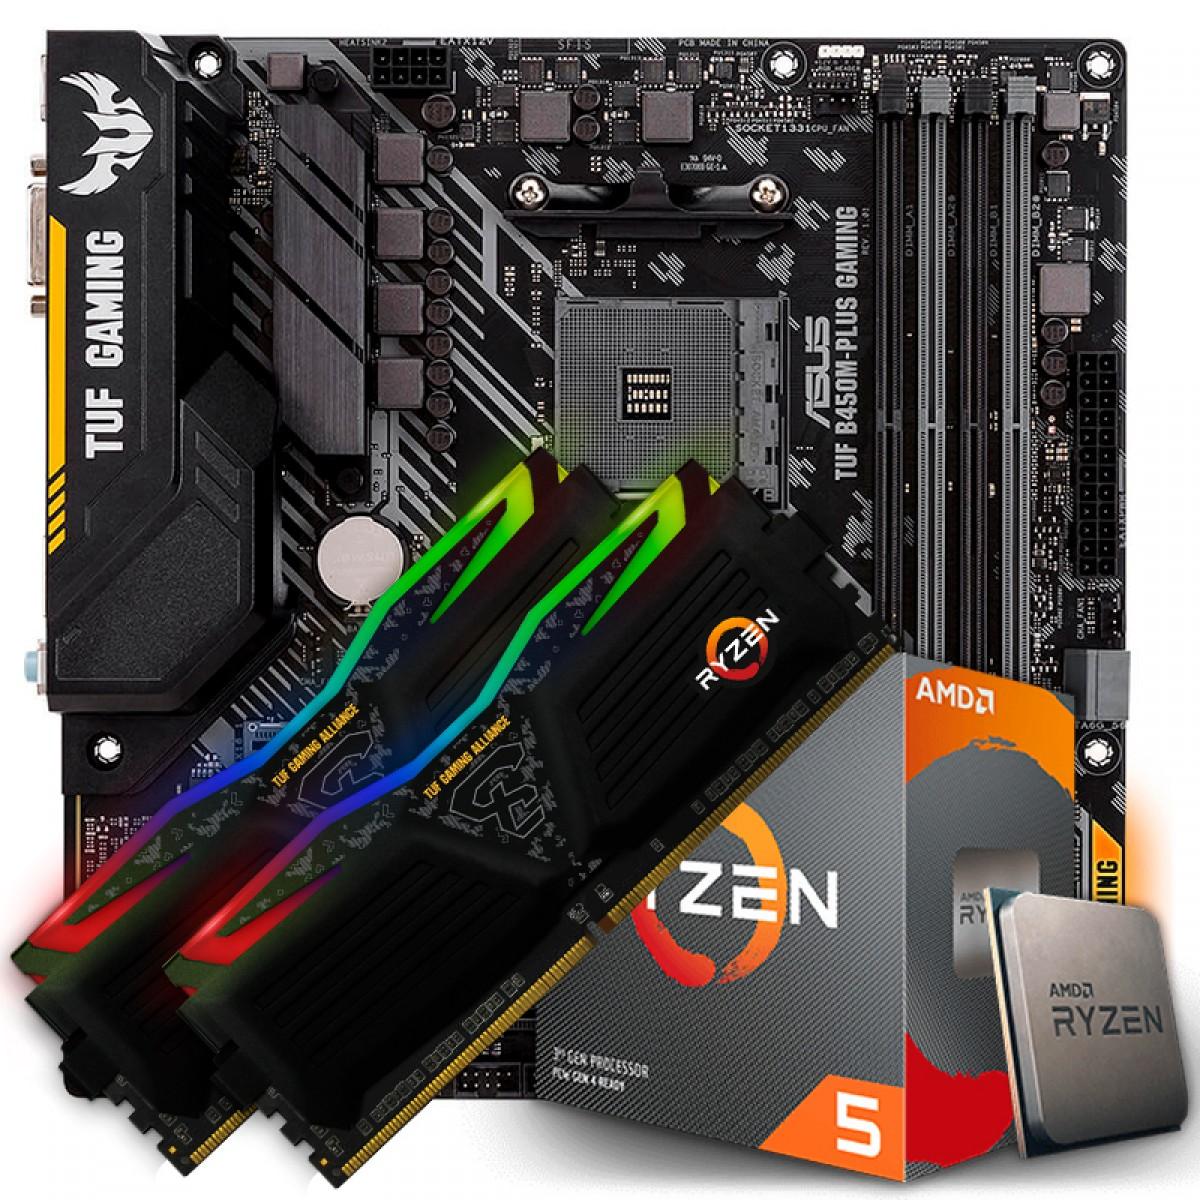 Kit Upgrade Placa Mãe Asus TUF B450M-PLUS GAMING, AMD AM4 + Processador AMD Ryzen 5 3600 3.6GHz + Memória TUF DDR4 16GB (2x8GB) 3000MHz